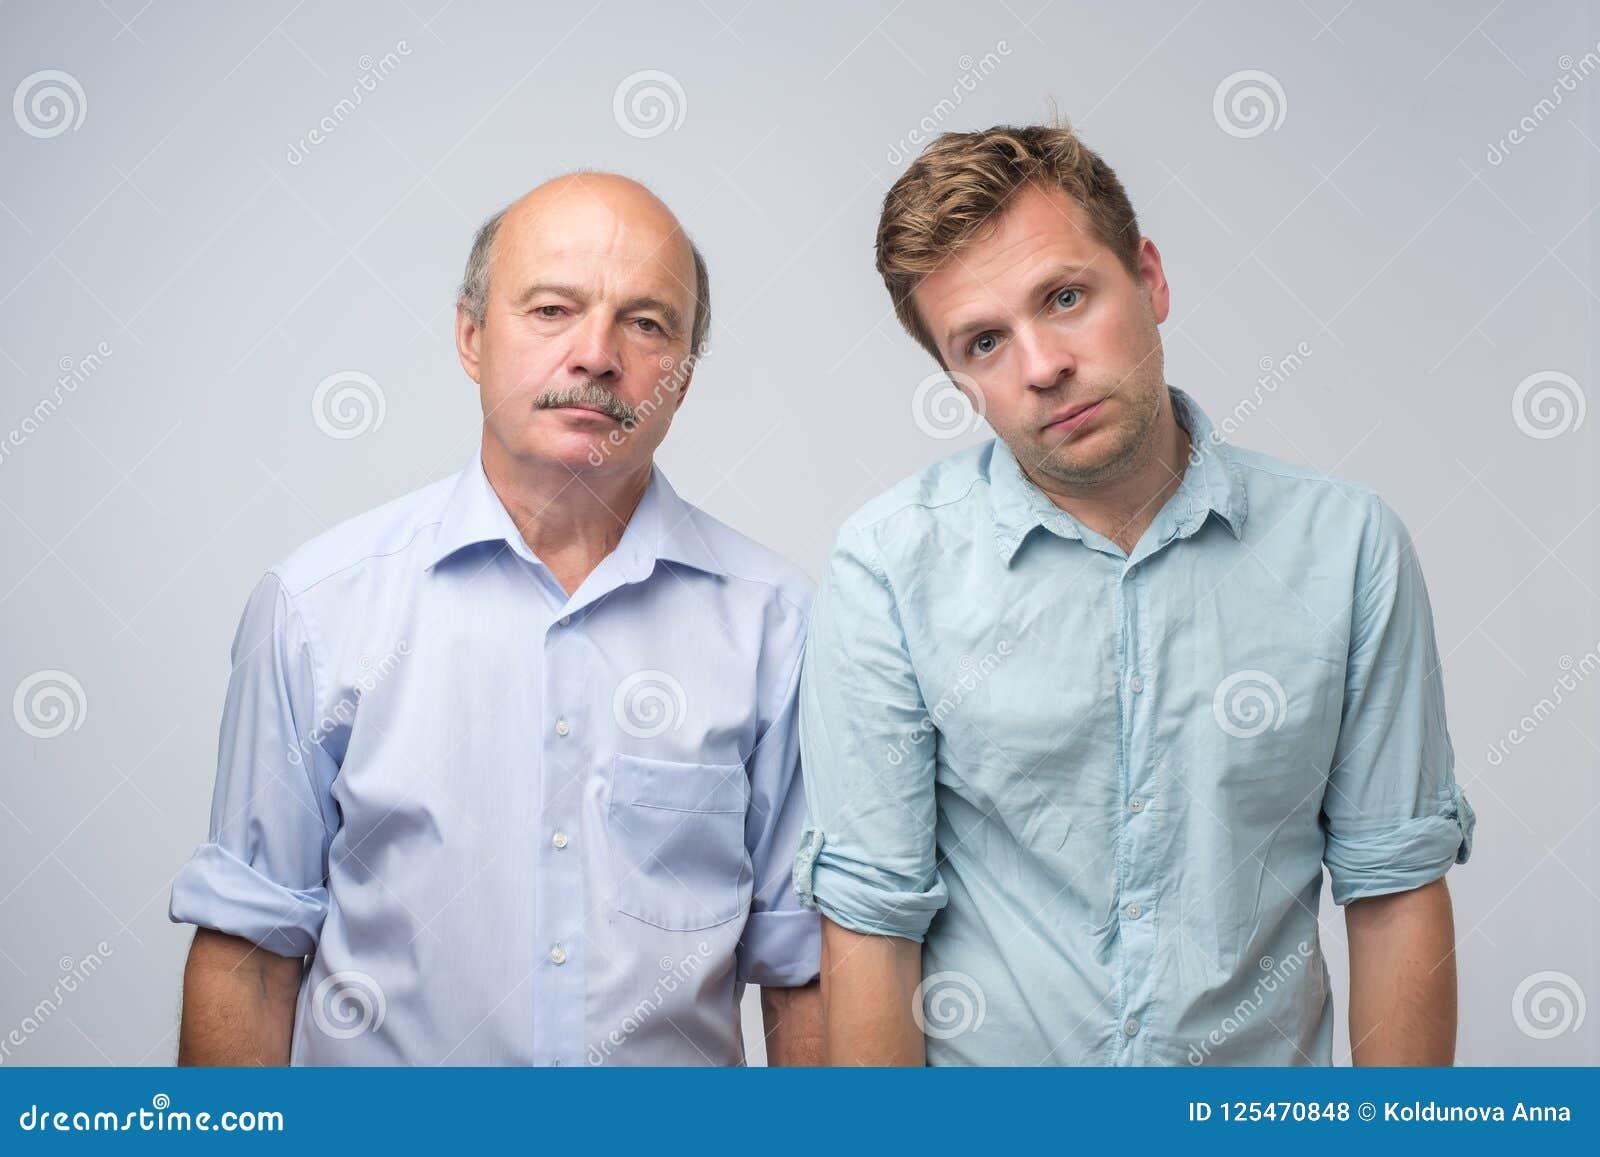 Two mature men